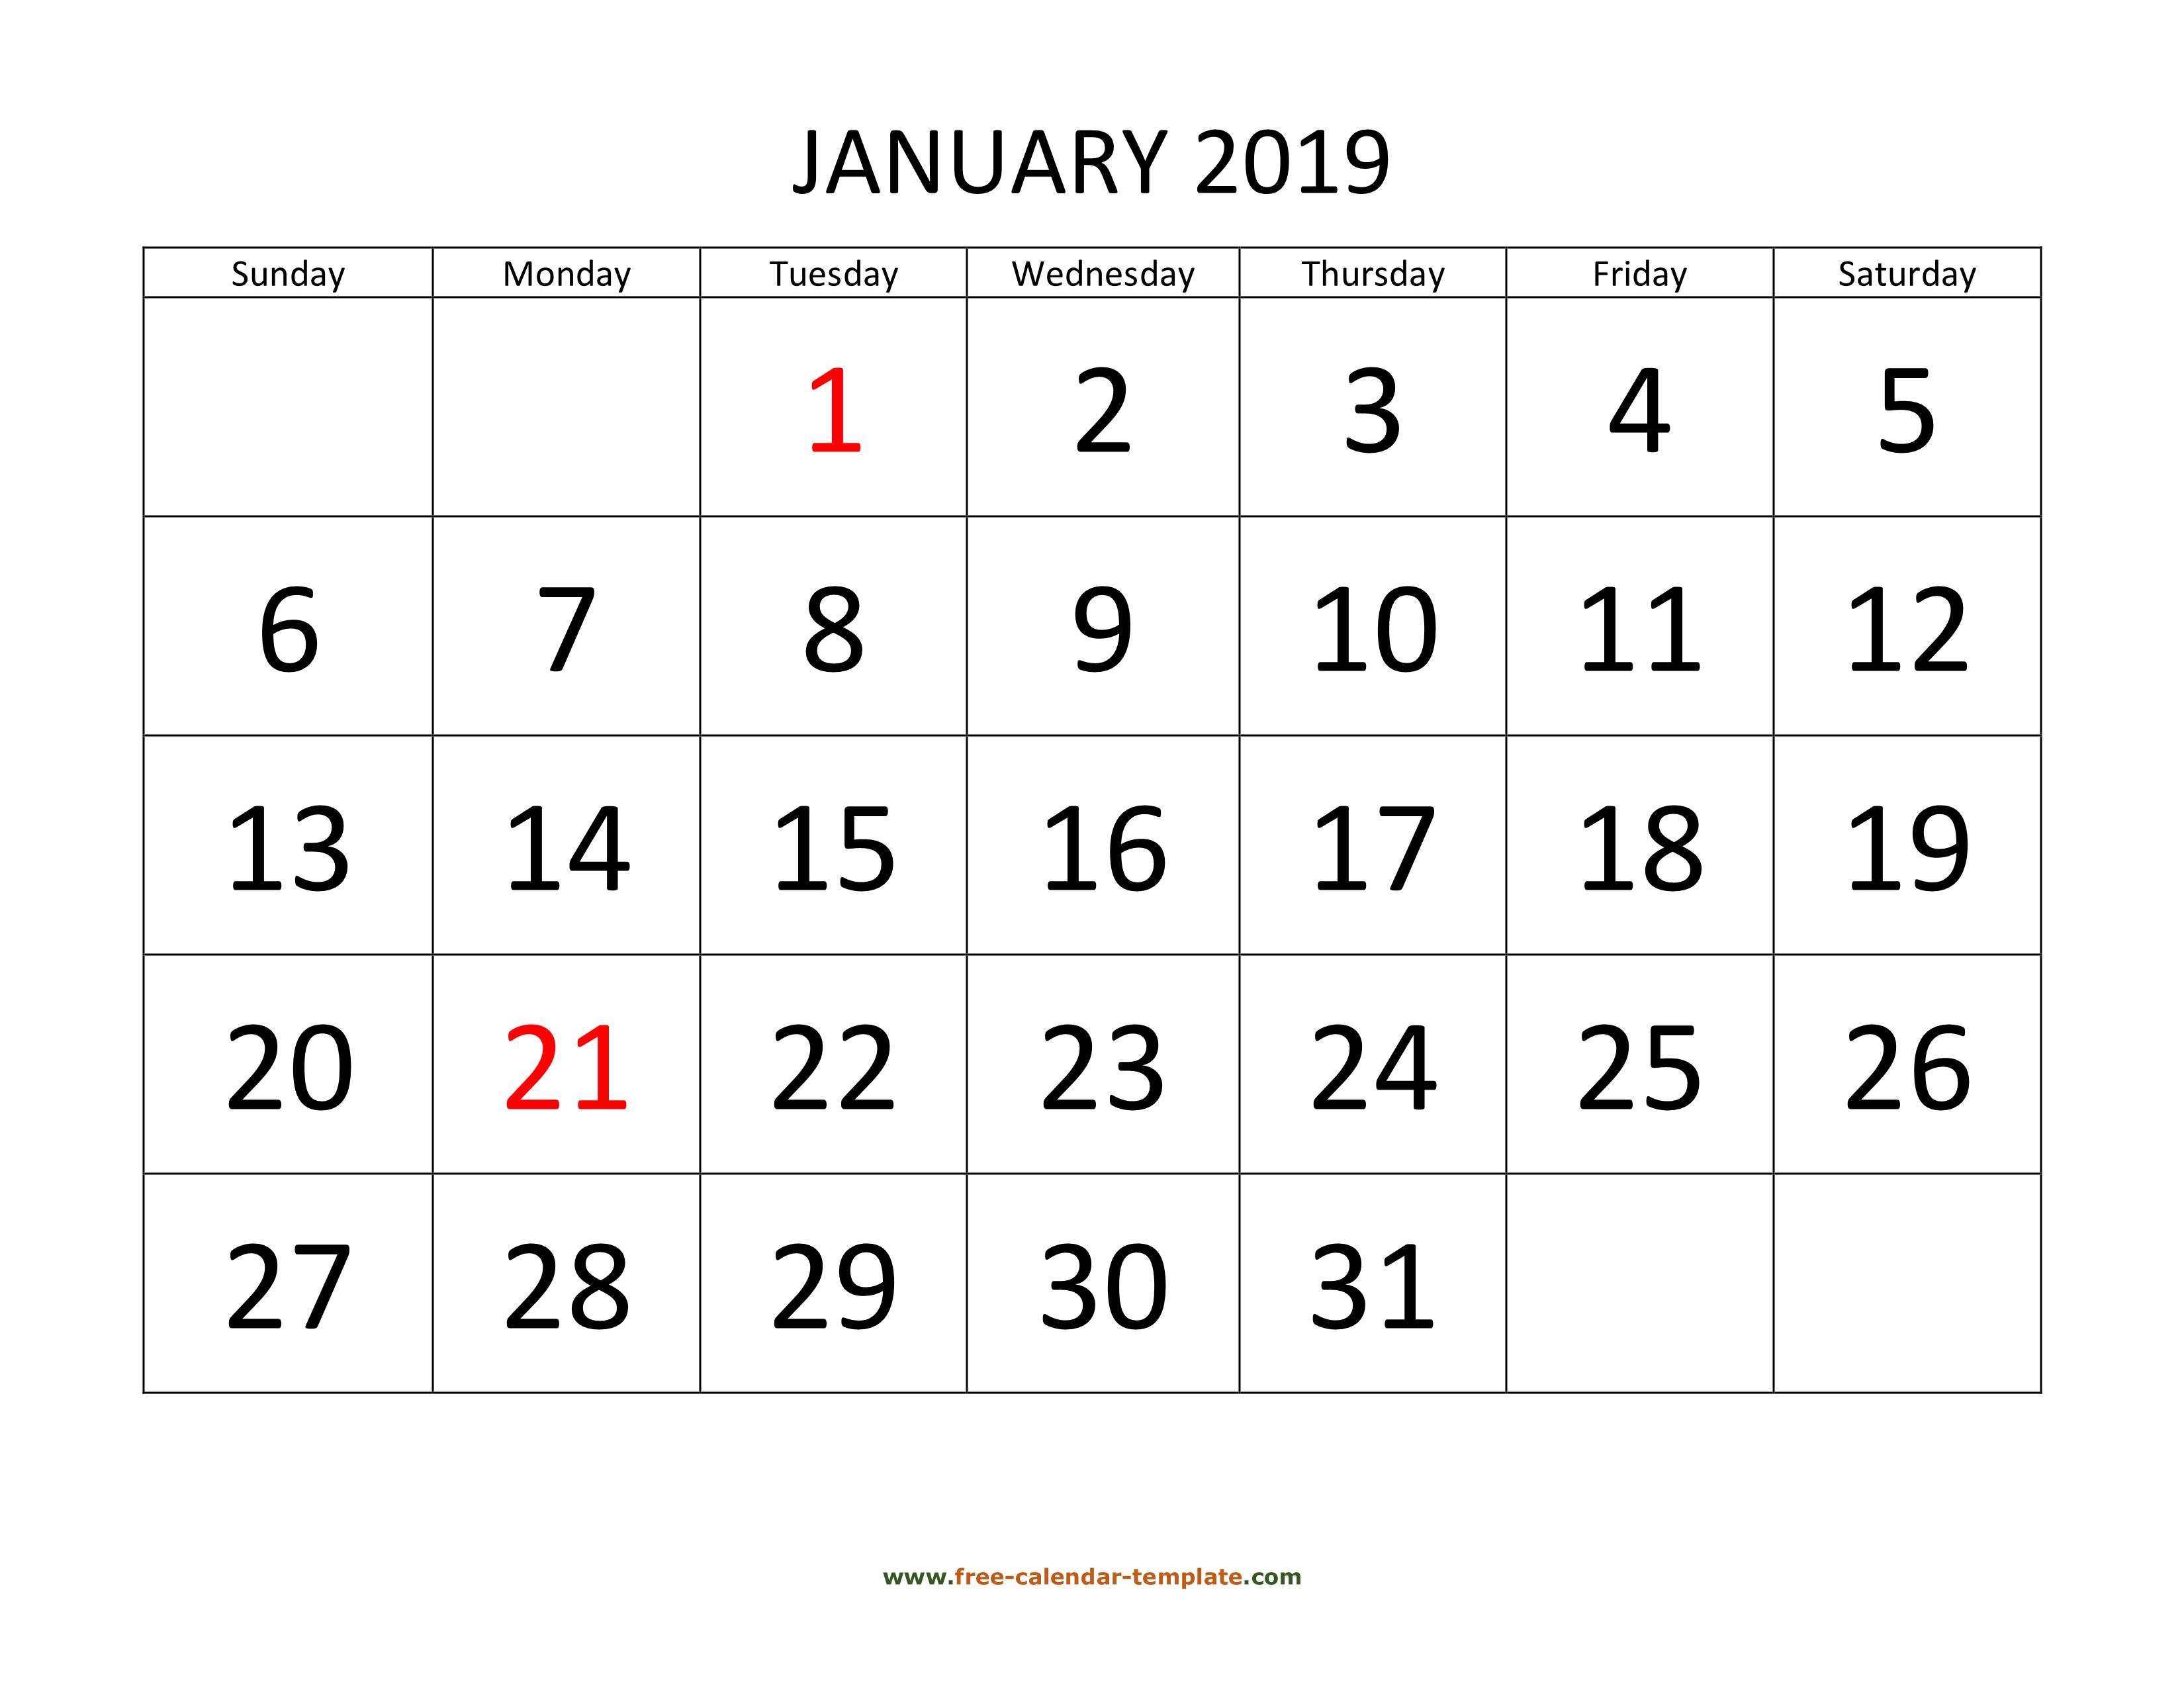 Printable Monthly Calendar 2019 | Free-Calendar-Template